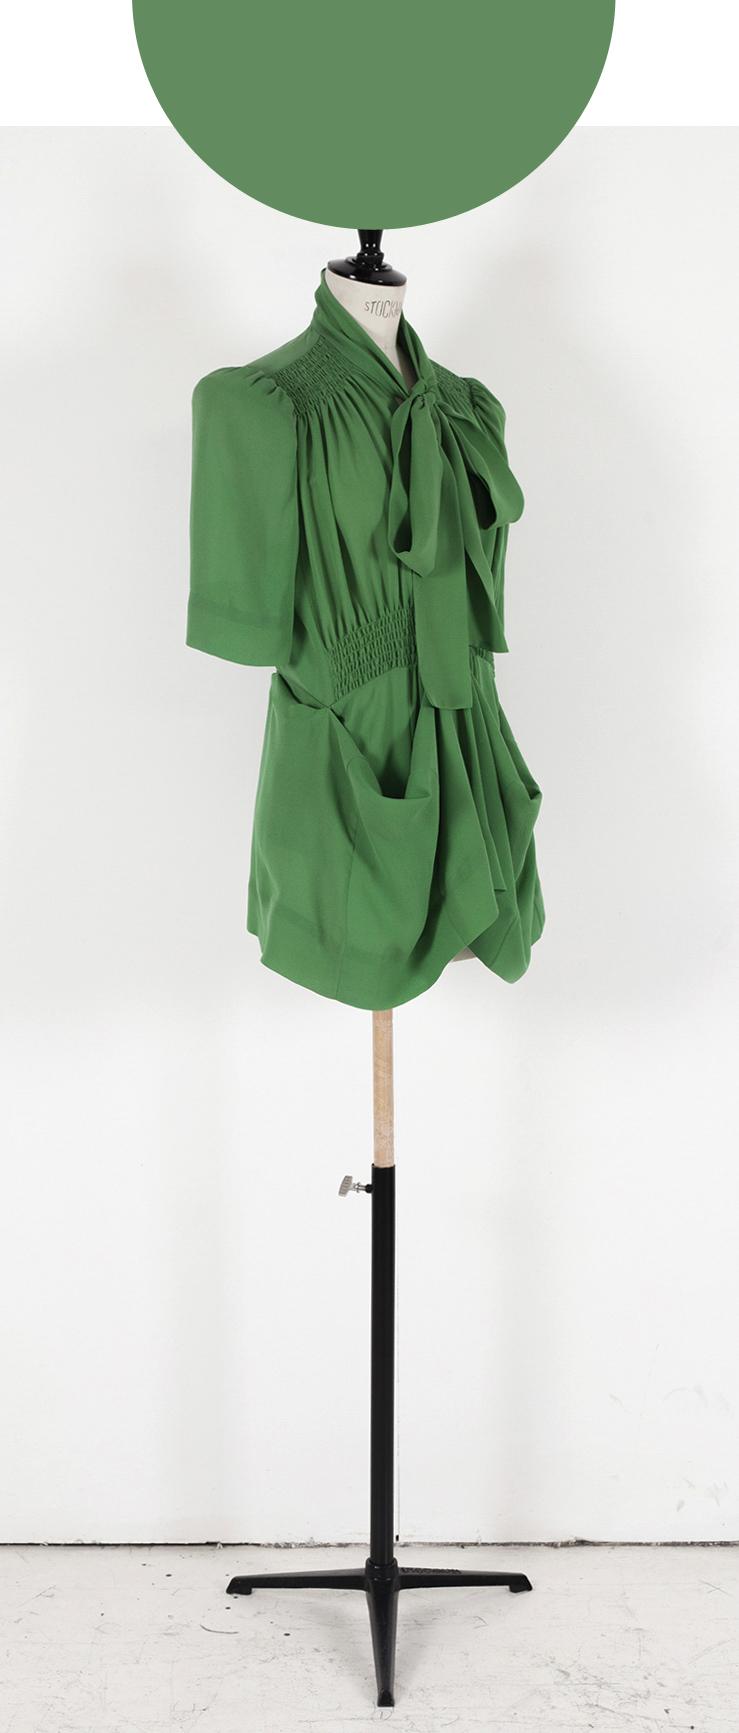 02 BRIGHT GREEN/ Short Sleeve, Adaptor Blouse/Knee length Dress